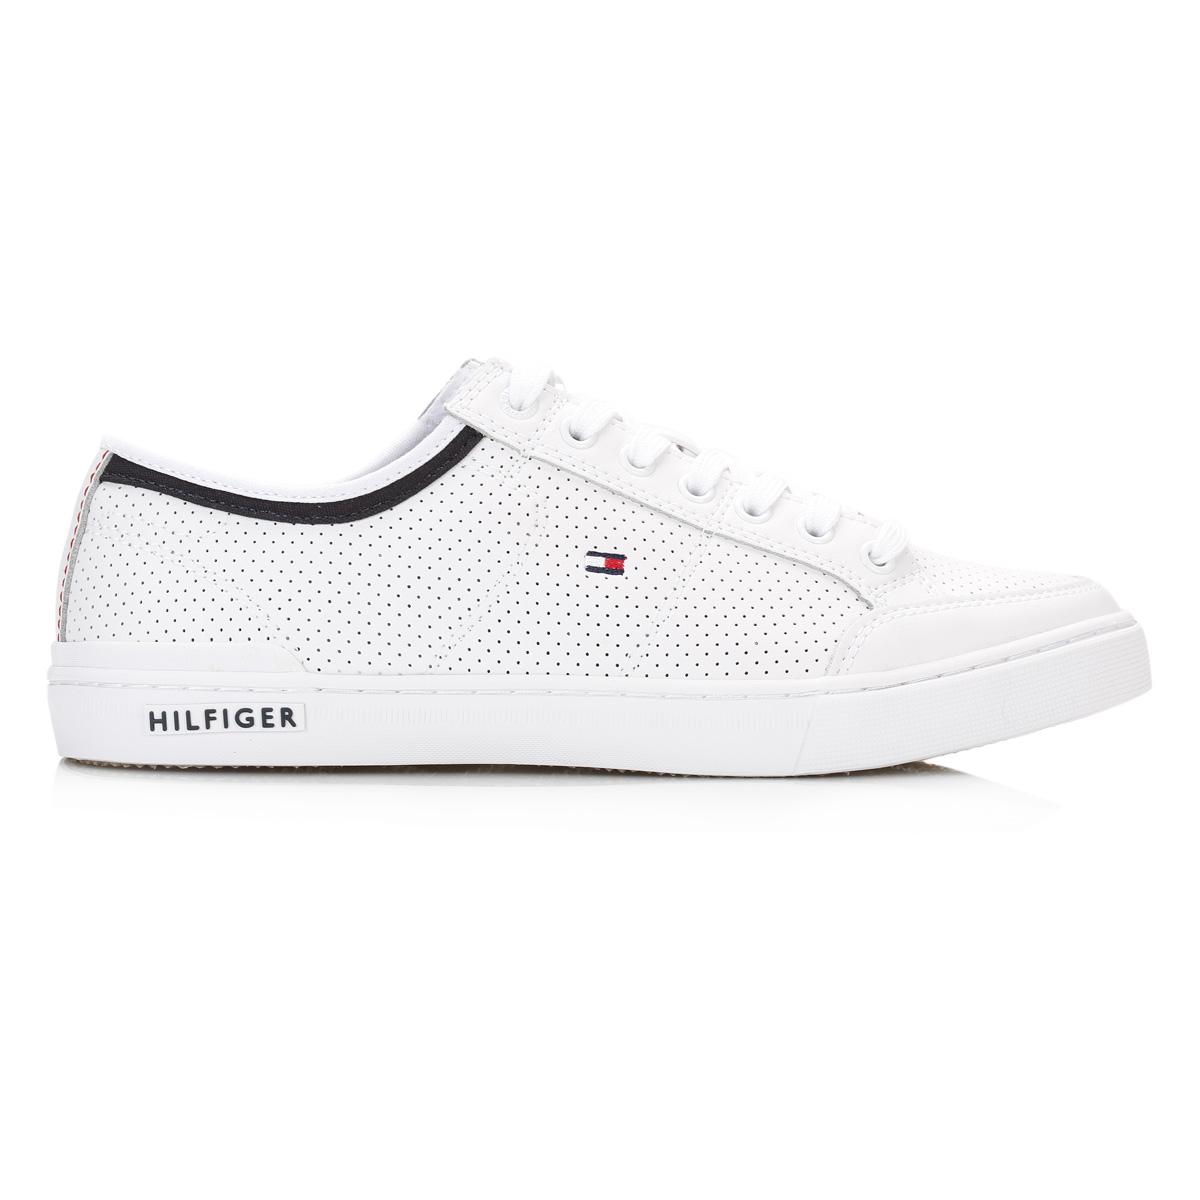 buy cheap huge surprise Tommy Hilfiger White Casual Sneakers cheap wholesale high quality sale online 9EkJmc0LmF